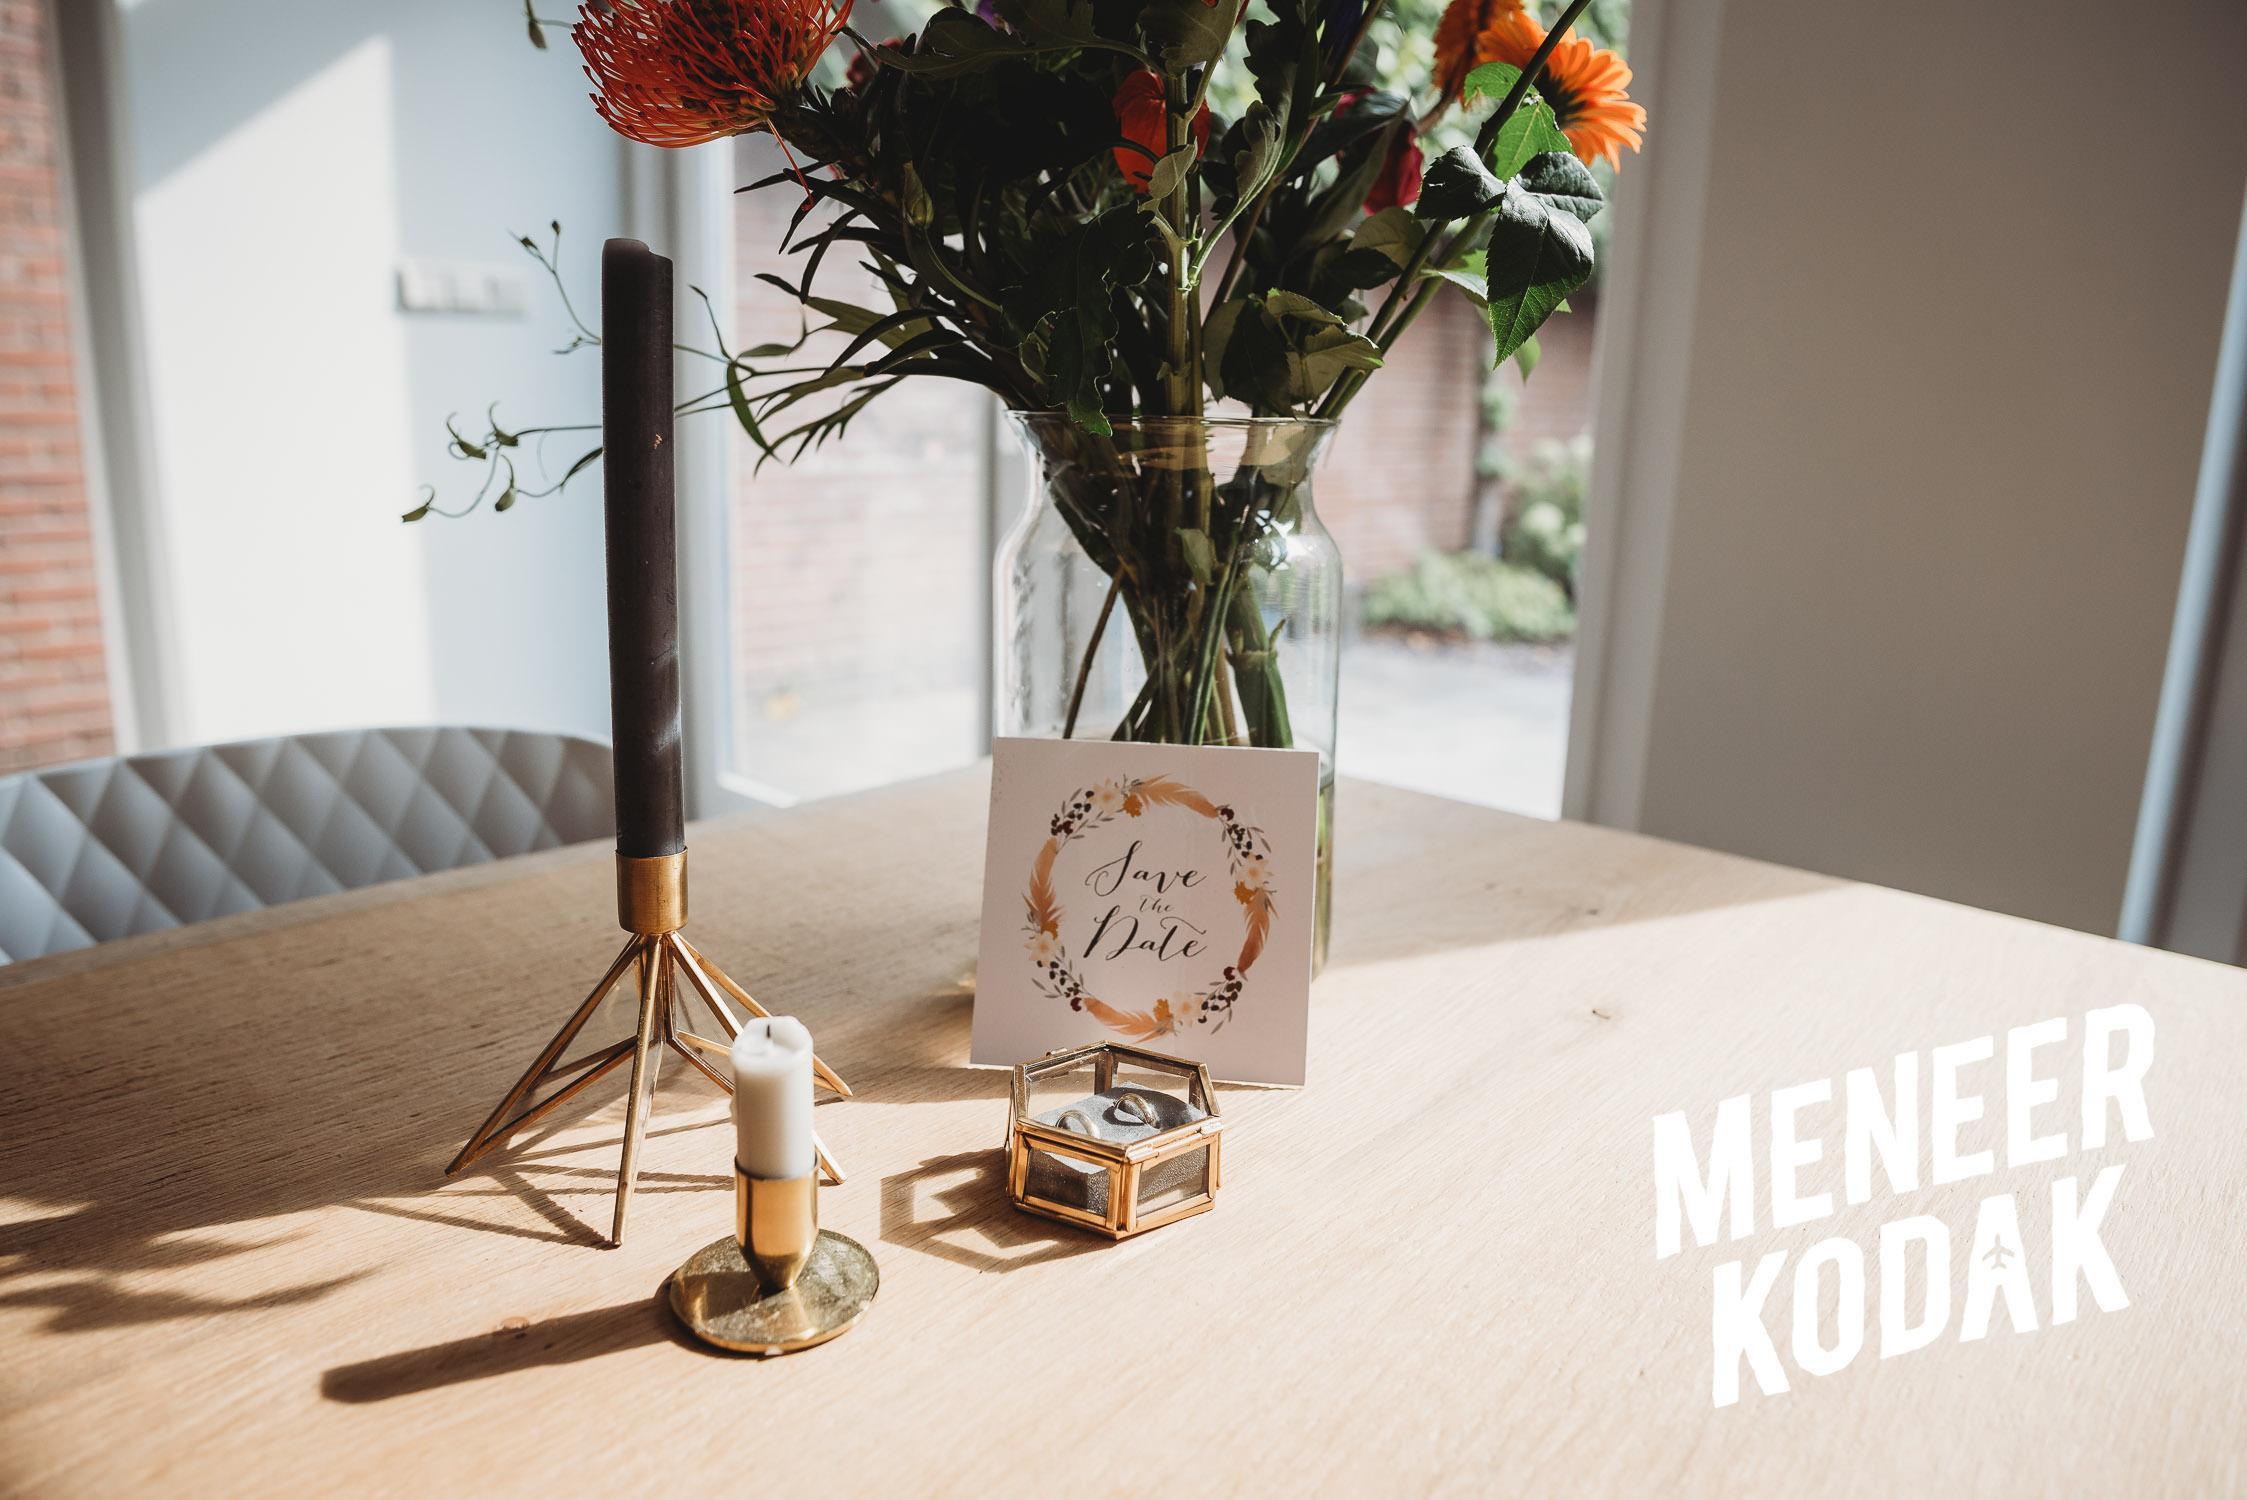 Meneer Kodak - Trouwreportage - Breda - E&M-056.jpg